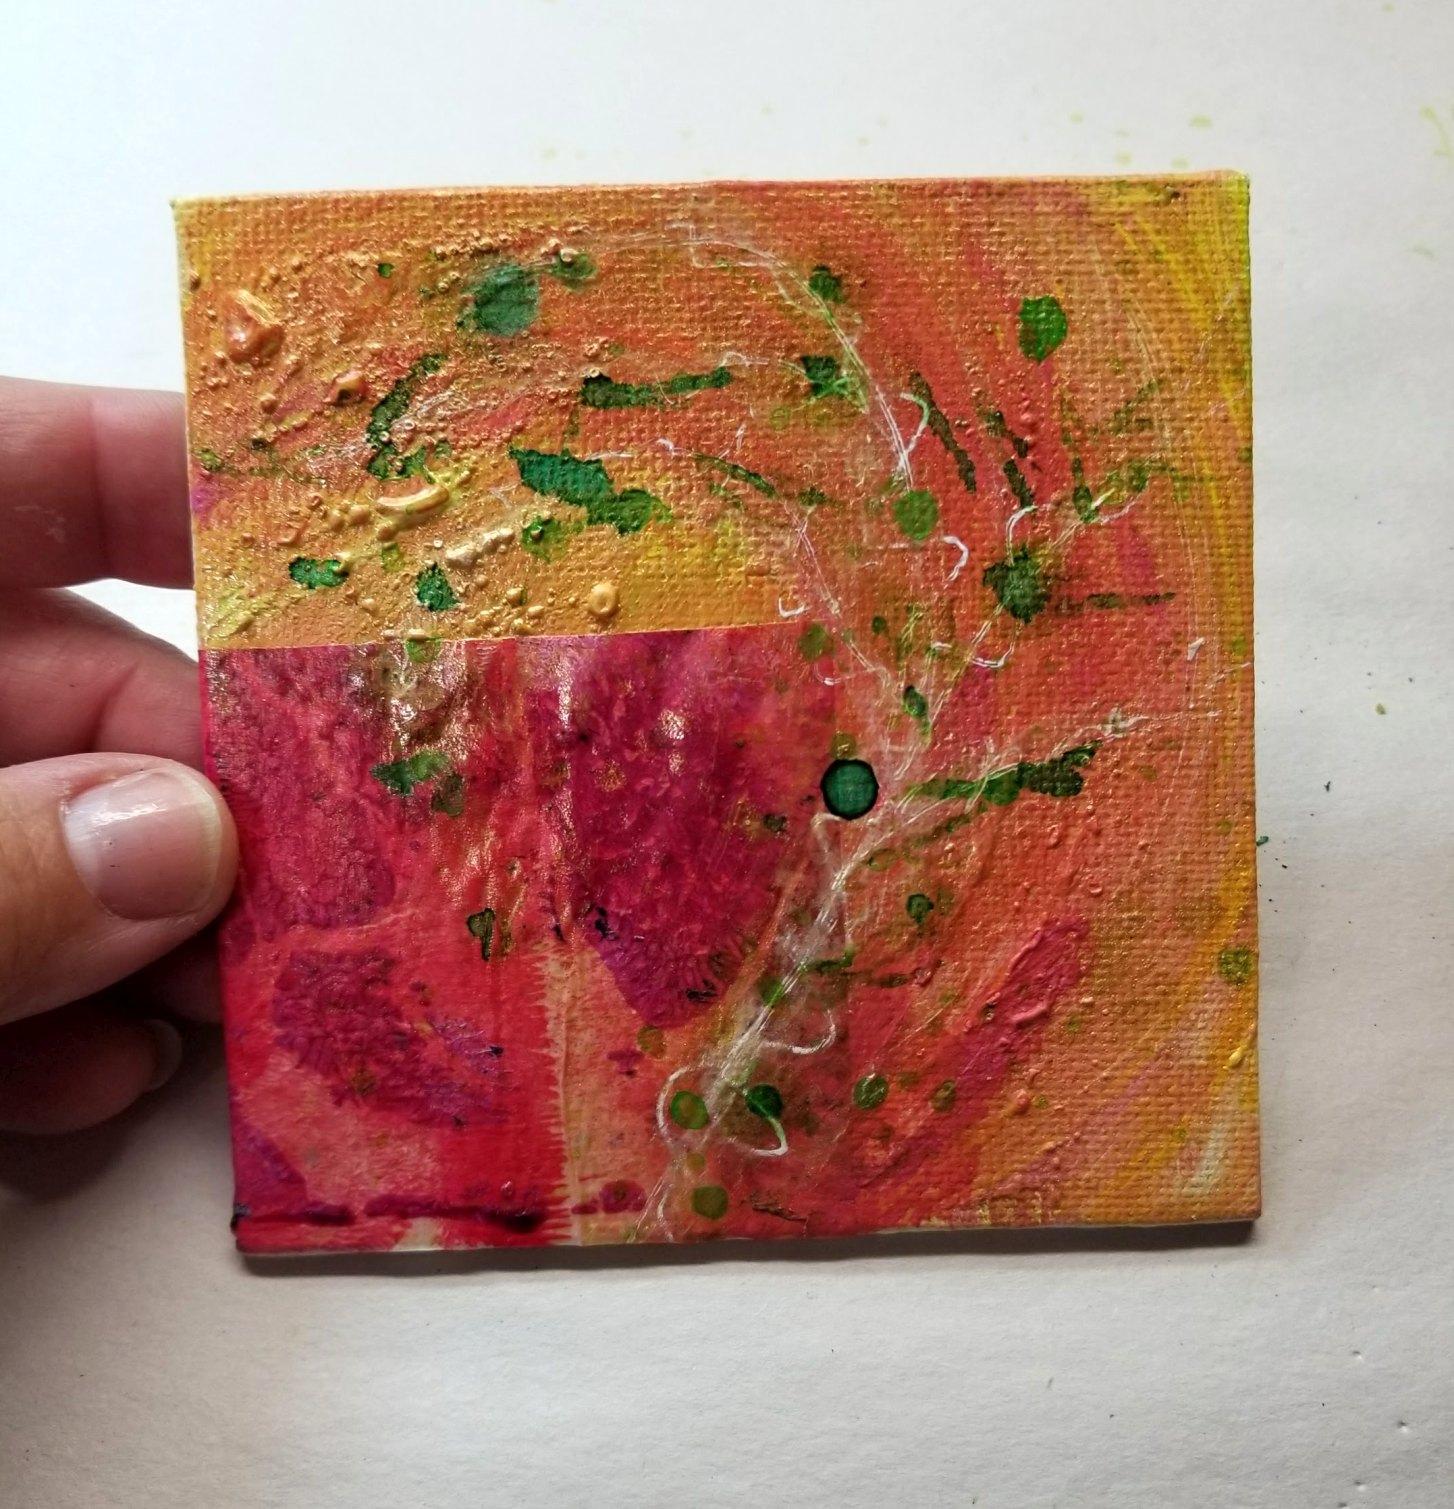 06. Swirl in pink & yellow